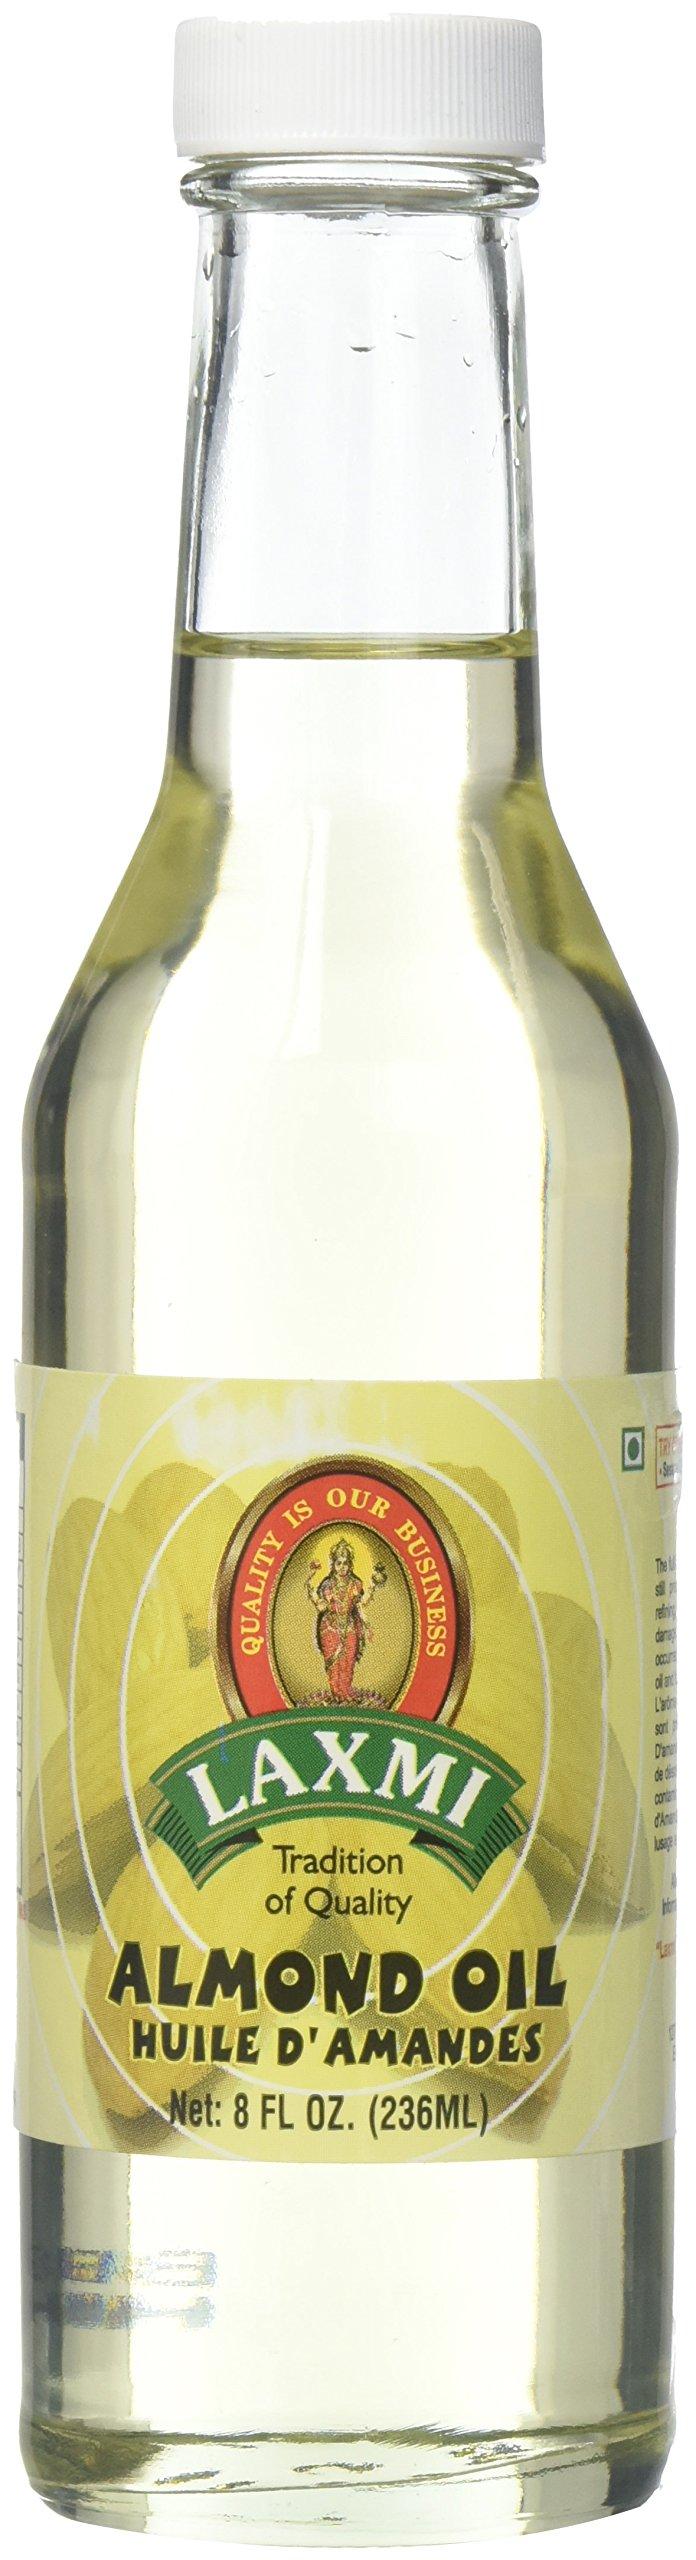 Laxmi, Almond Oil, 236 Milliliter(mL)